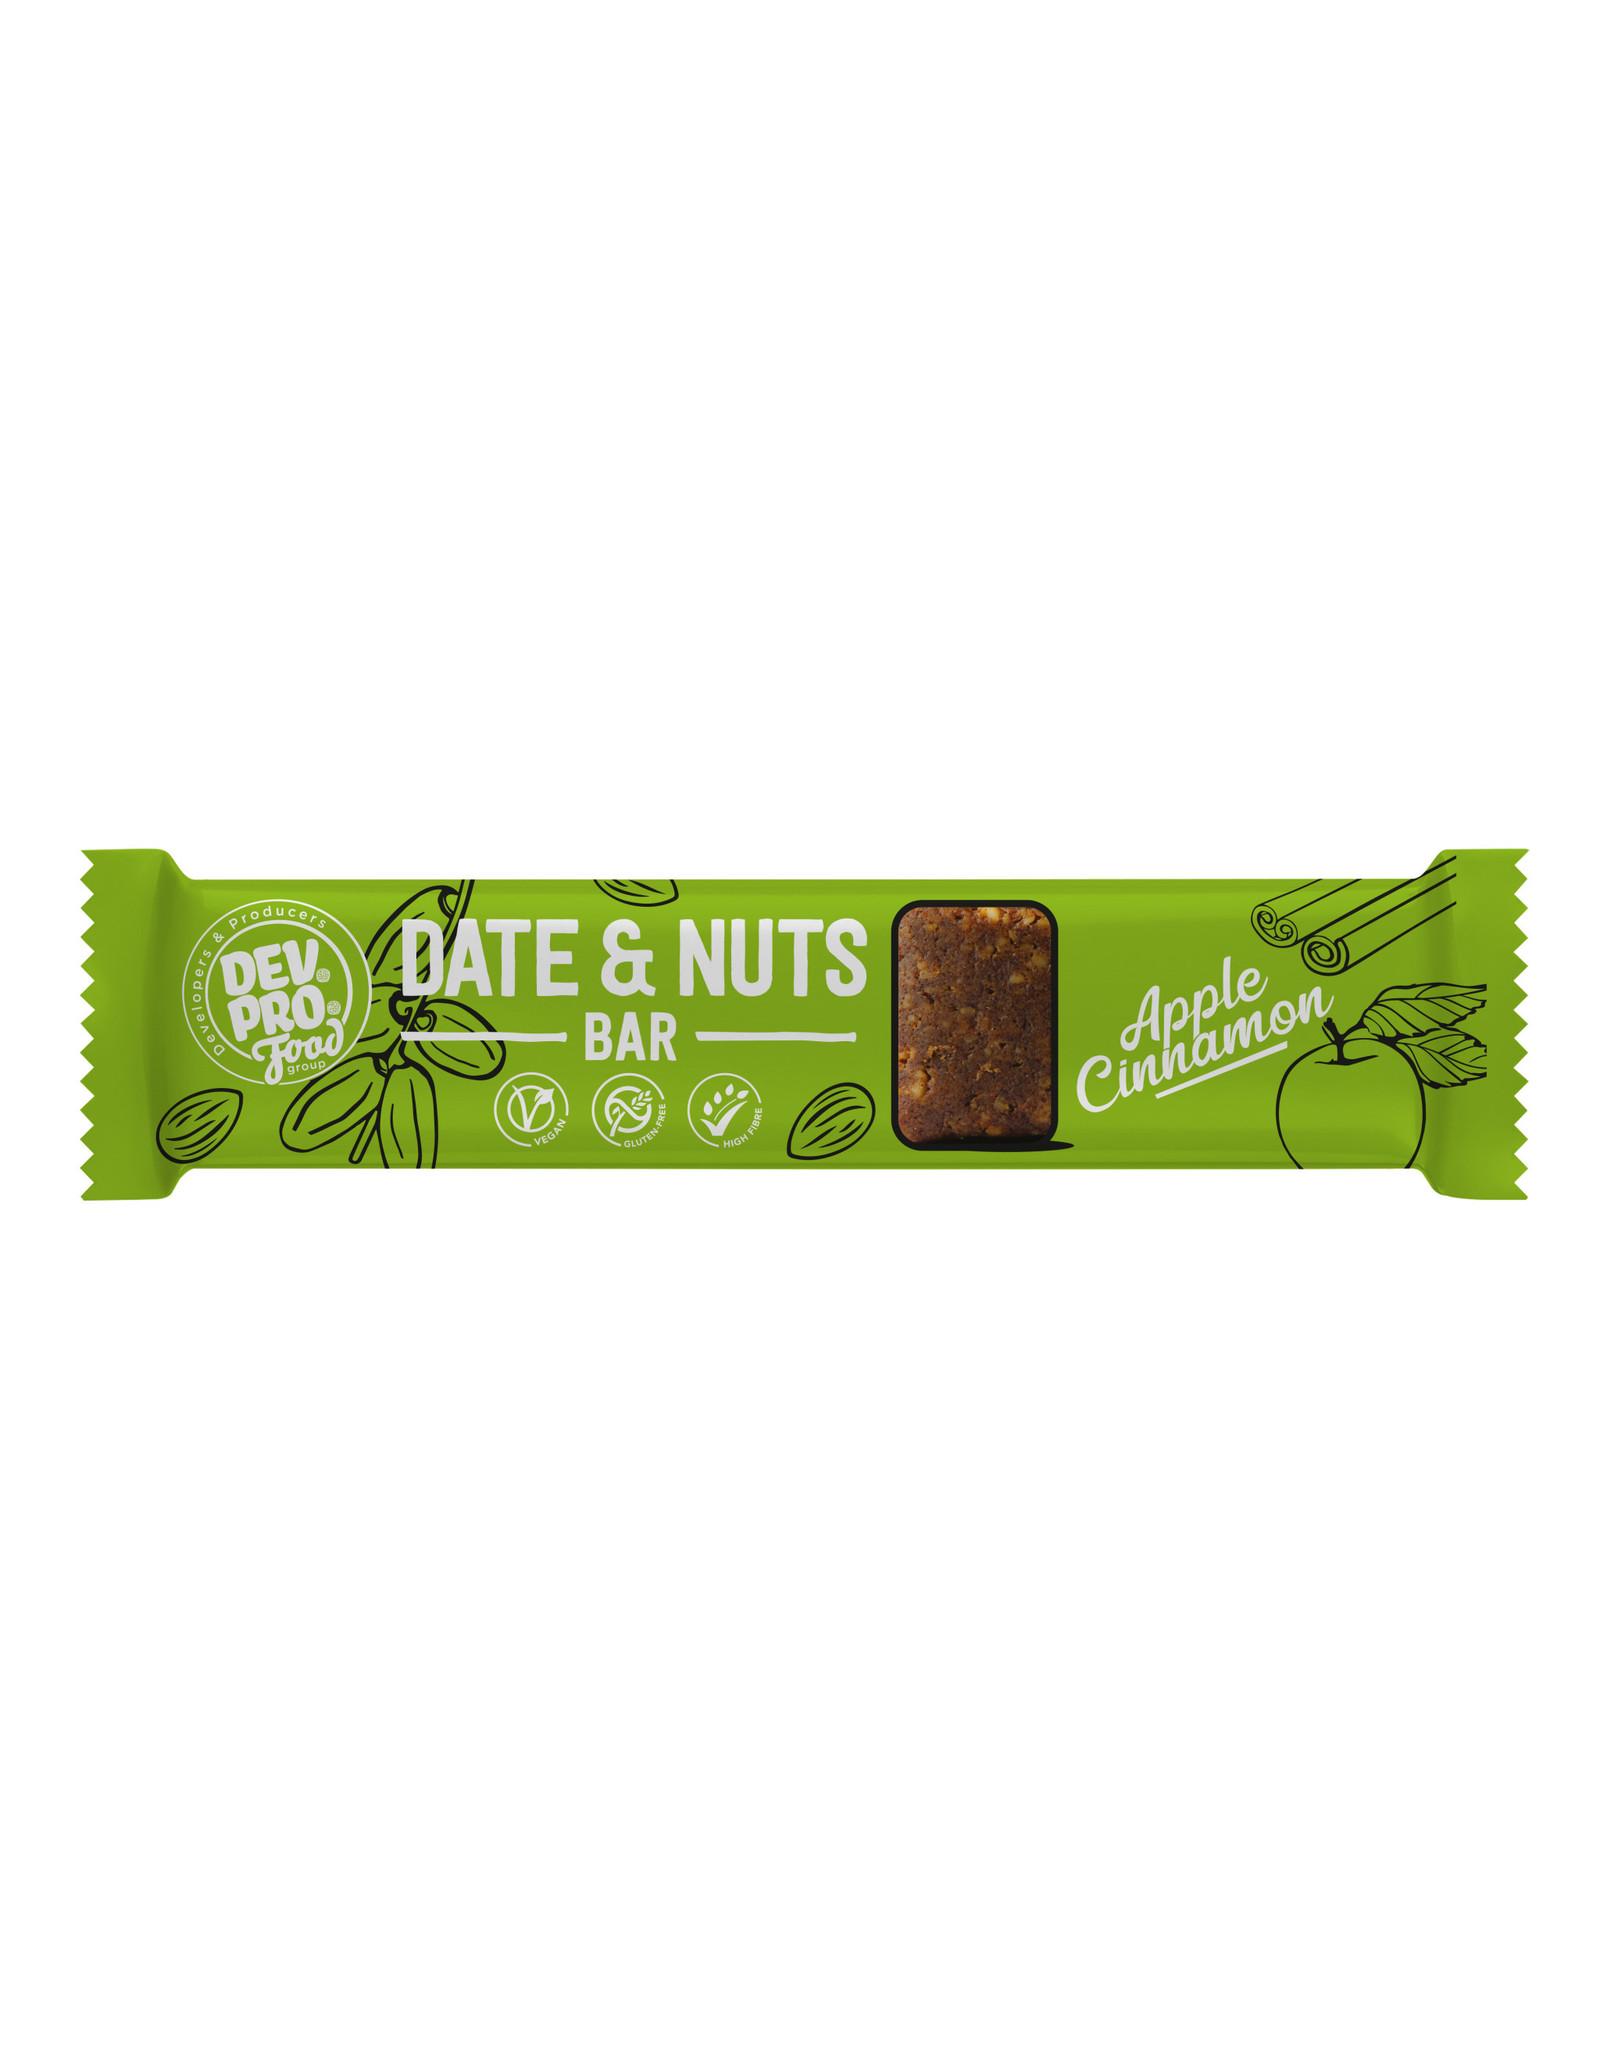 DEV. PRO. EUROPE Dev. Pro. Date & Nuts bar - Apple Cinnamon  - 30 gram - single (EU, TUR, RUS)